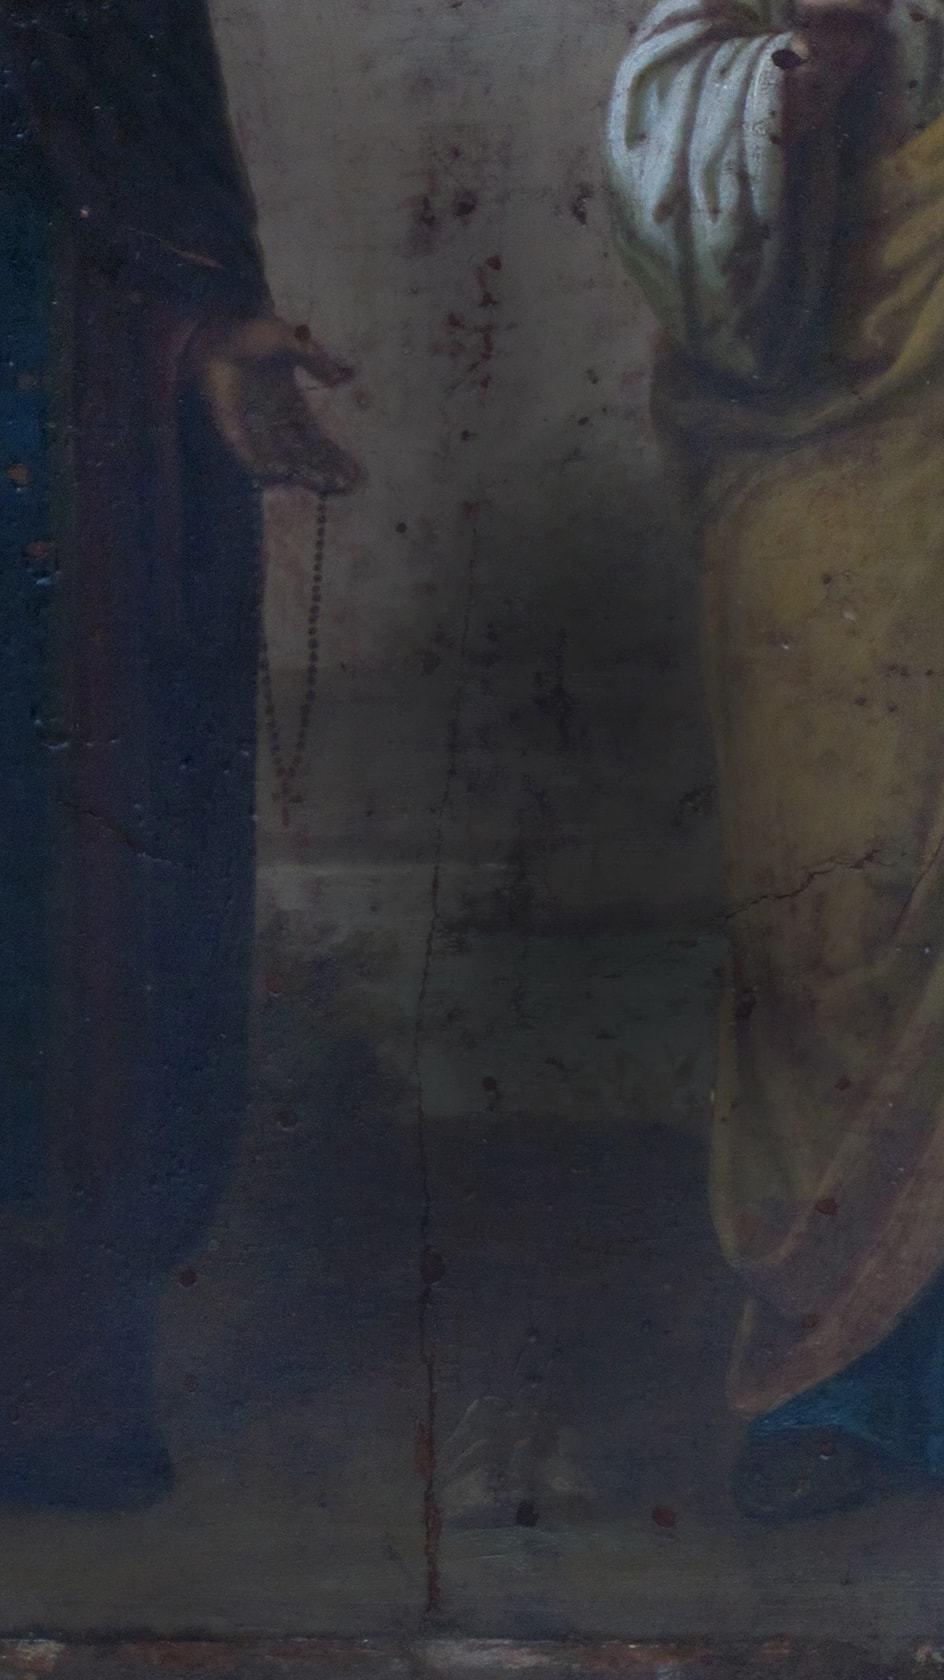 Реставрация икона, Св Лука, Св Мария Магдалина, реставрация деревянных икон, реставрация домашней иконы, реставрация иконы москва, реставрация иконы фото до и после